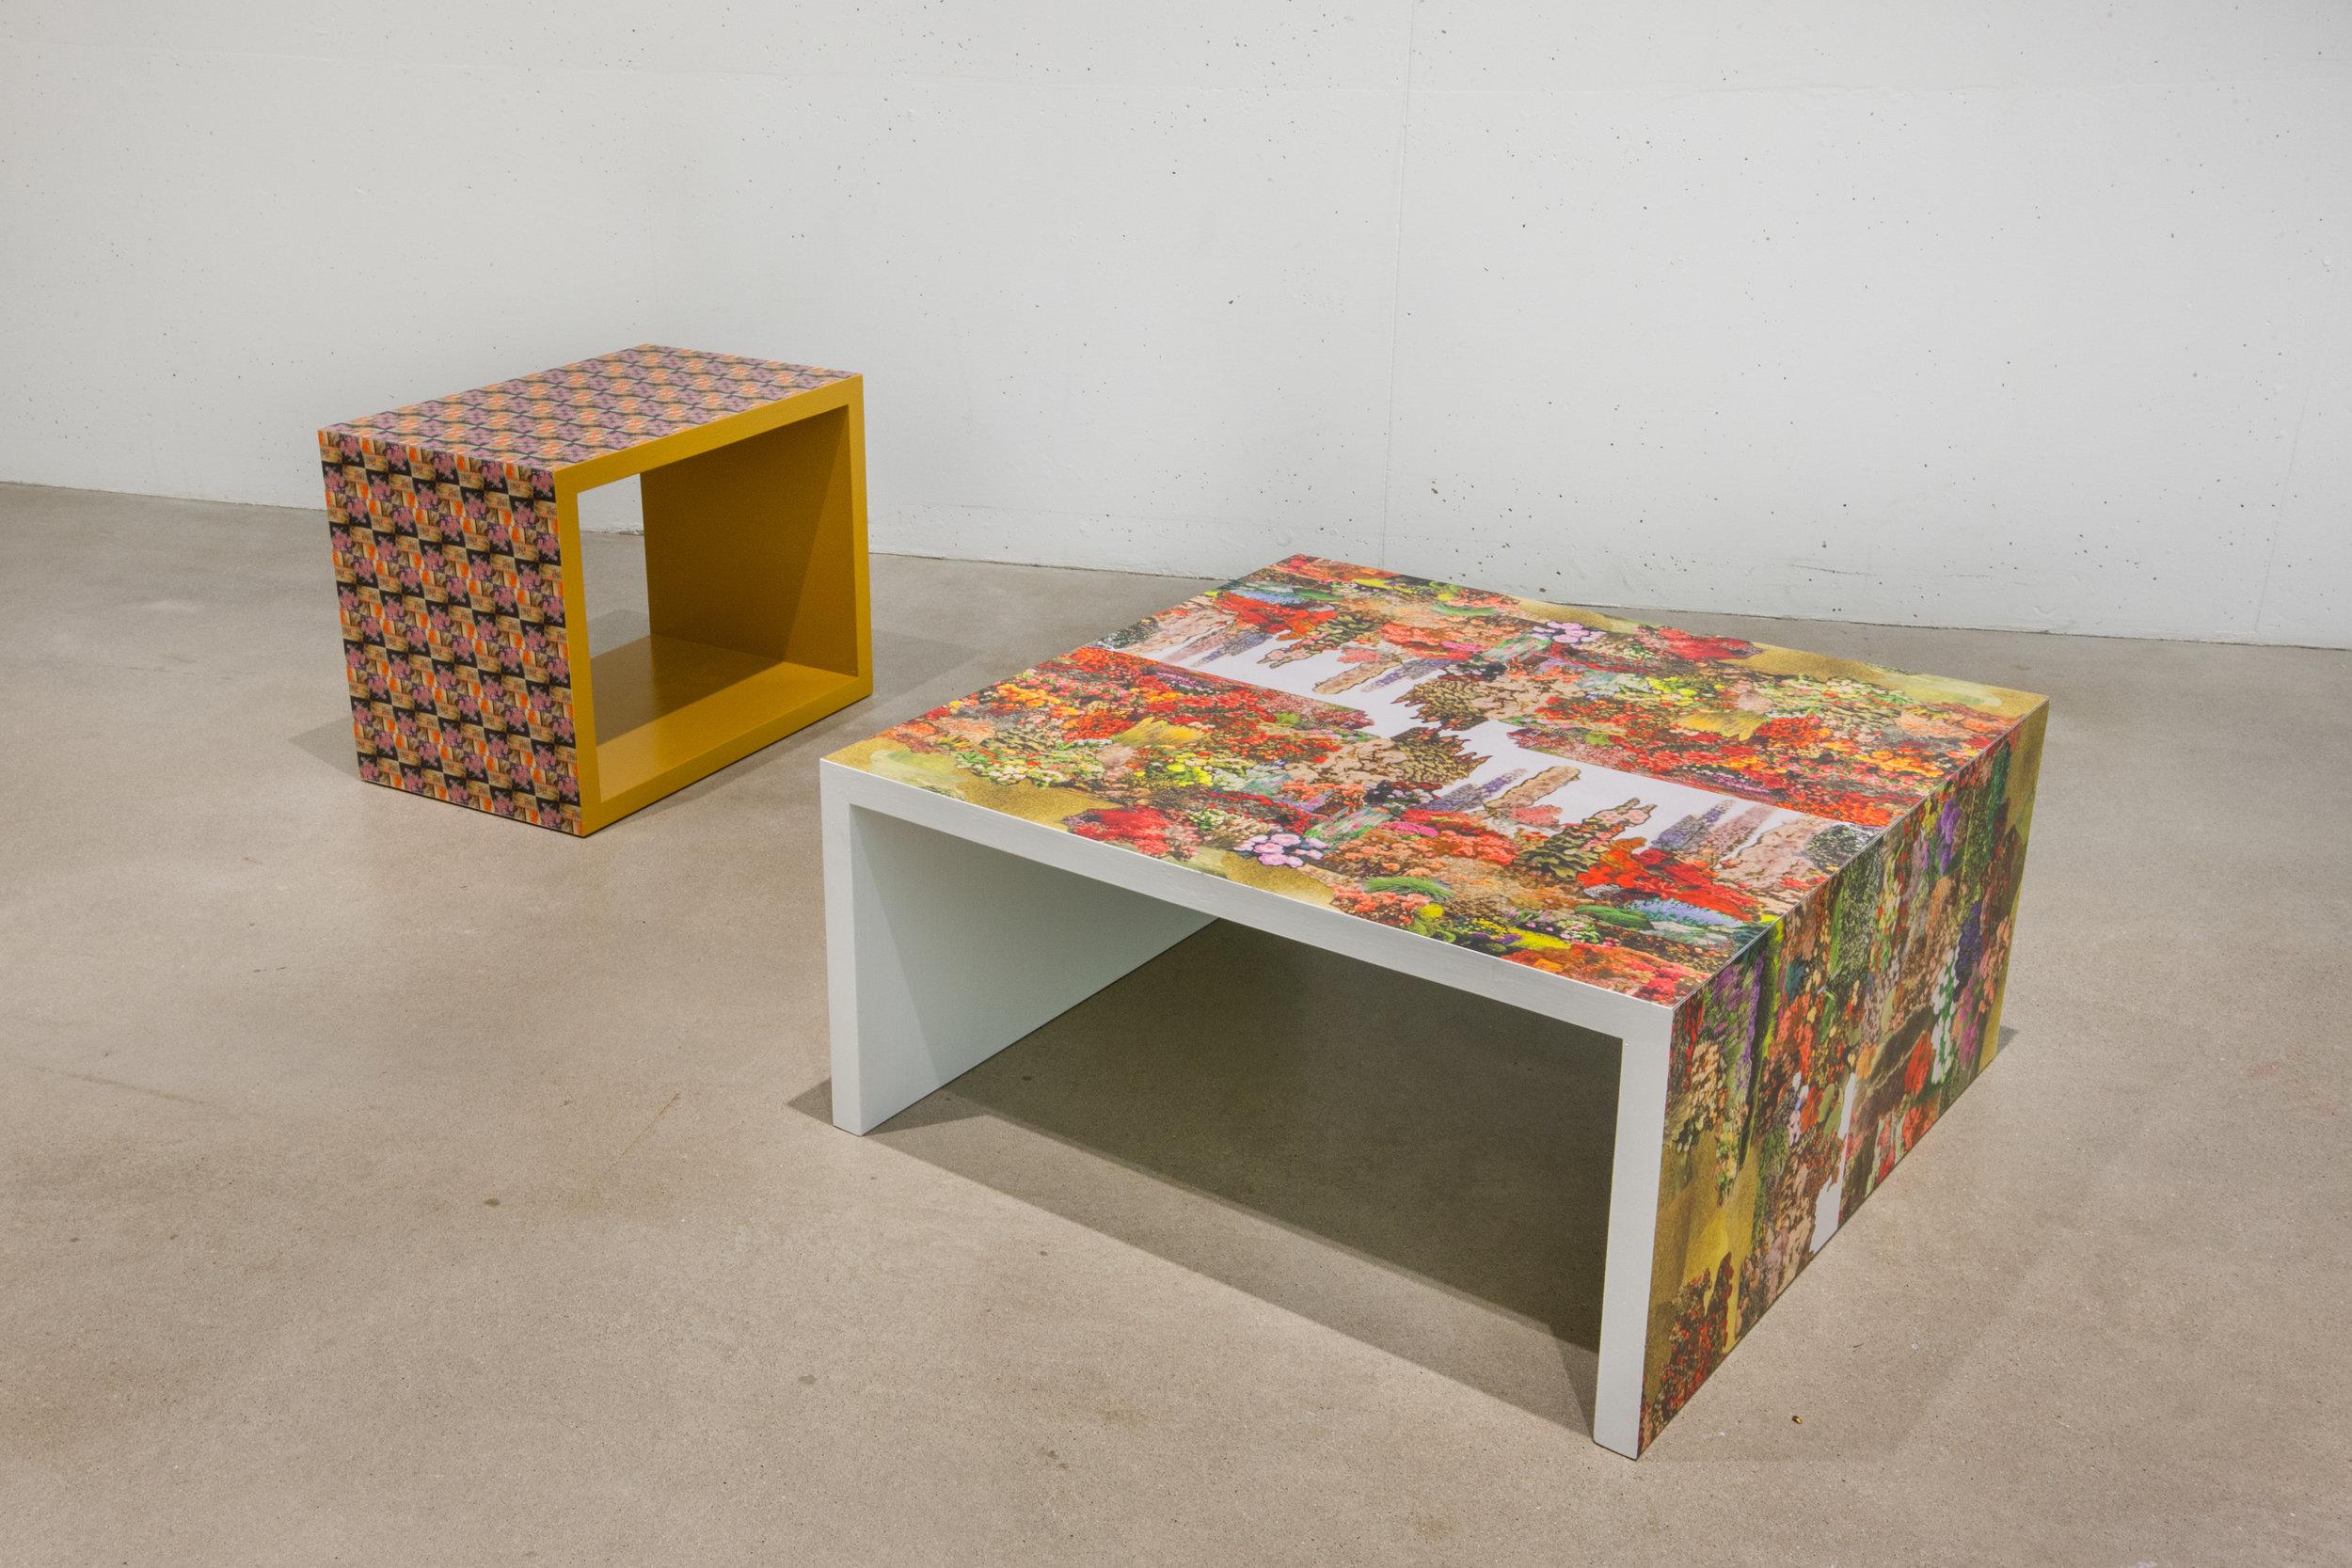 Suzanne Bradley Winning Ticket Design Iowa City Iowa University of Iowa UIOWA Furniture Art Design